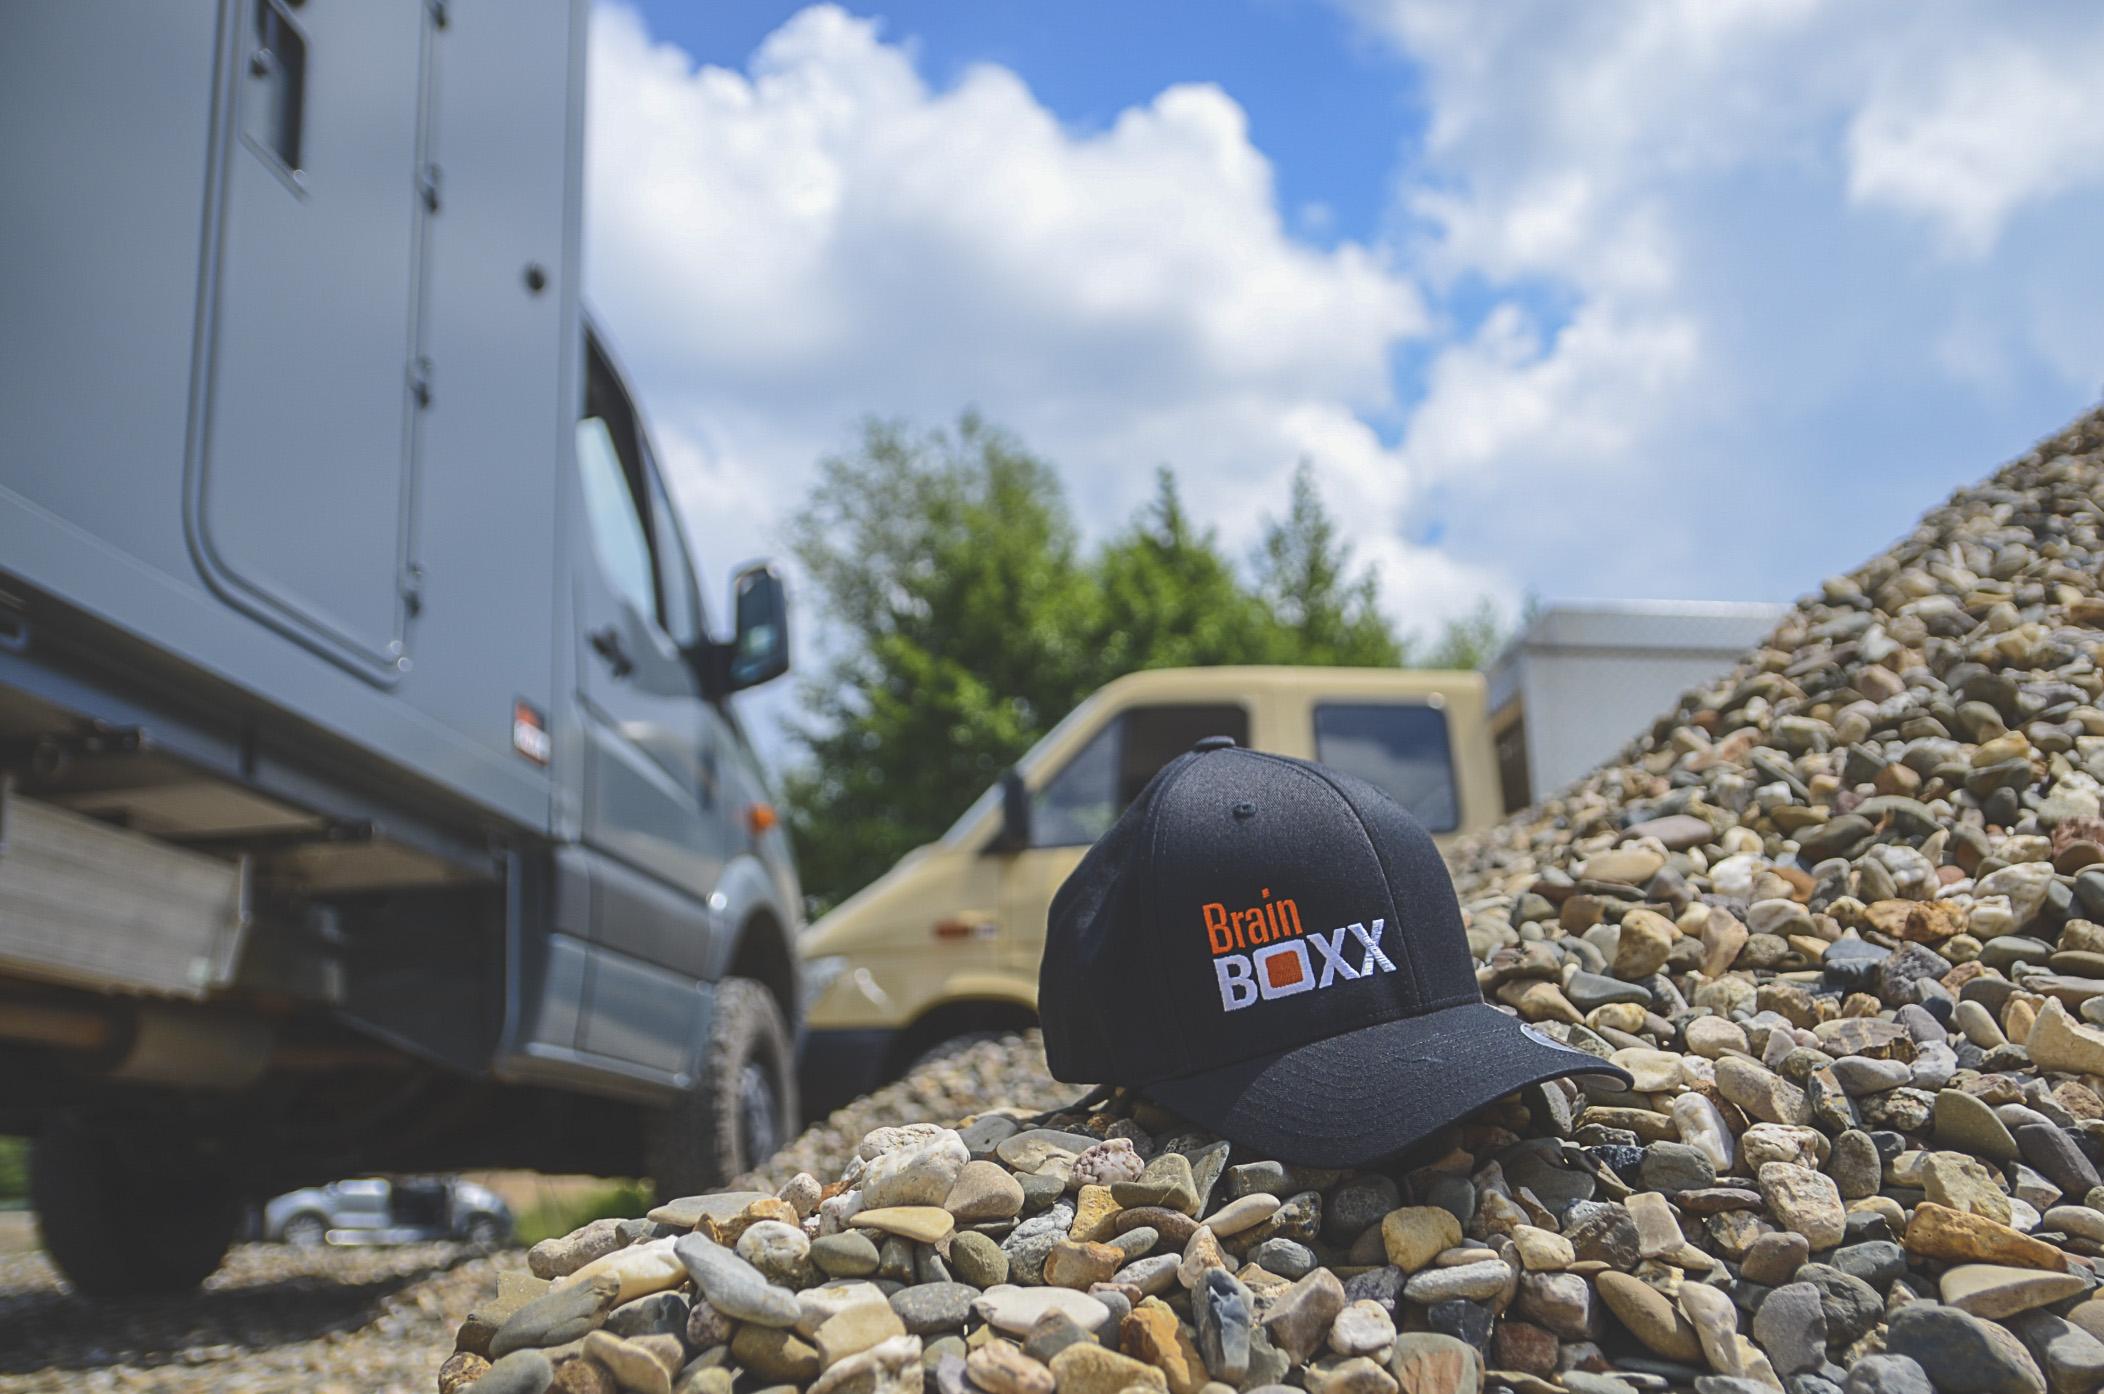 BrainBOXX Flex Caps (original black, logo stitch front)